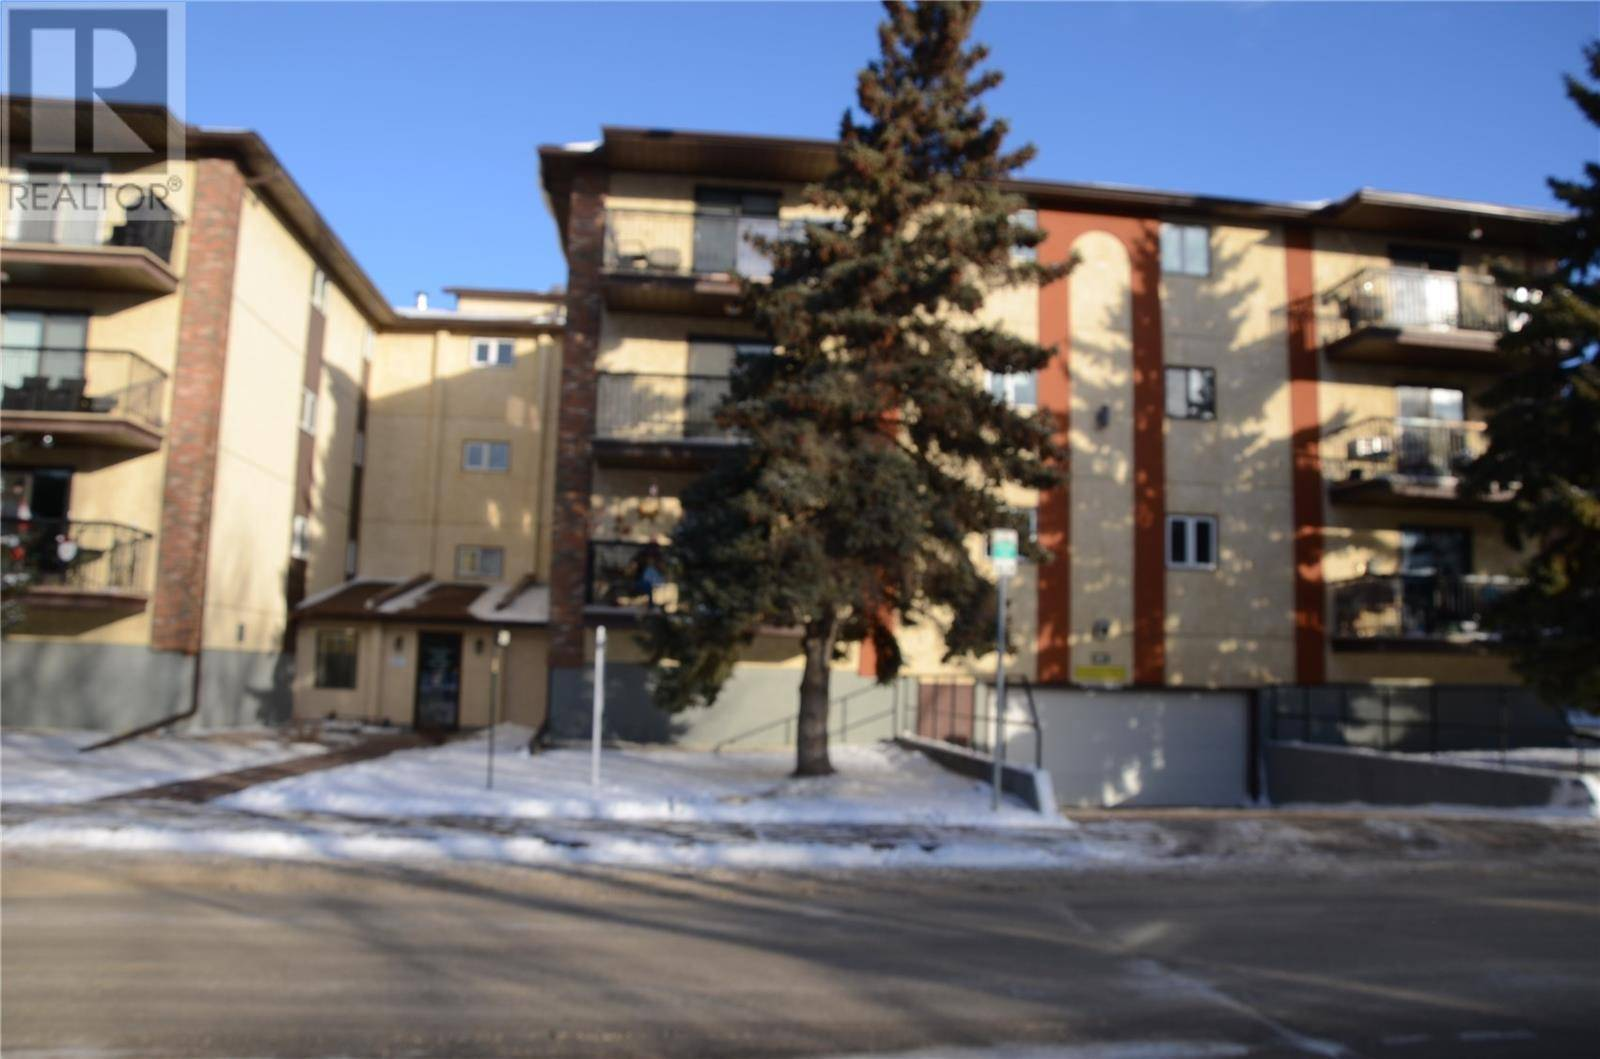 208 - 3140 Louise Street, Saskatoon | Image 1